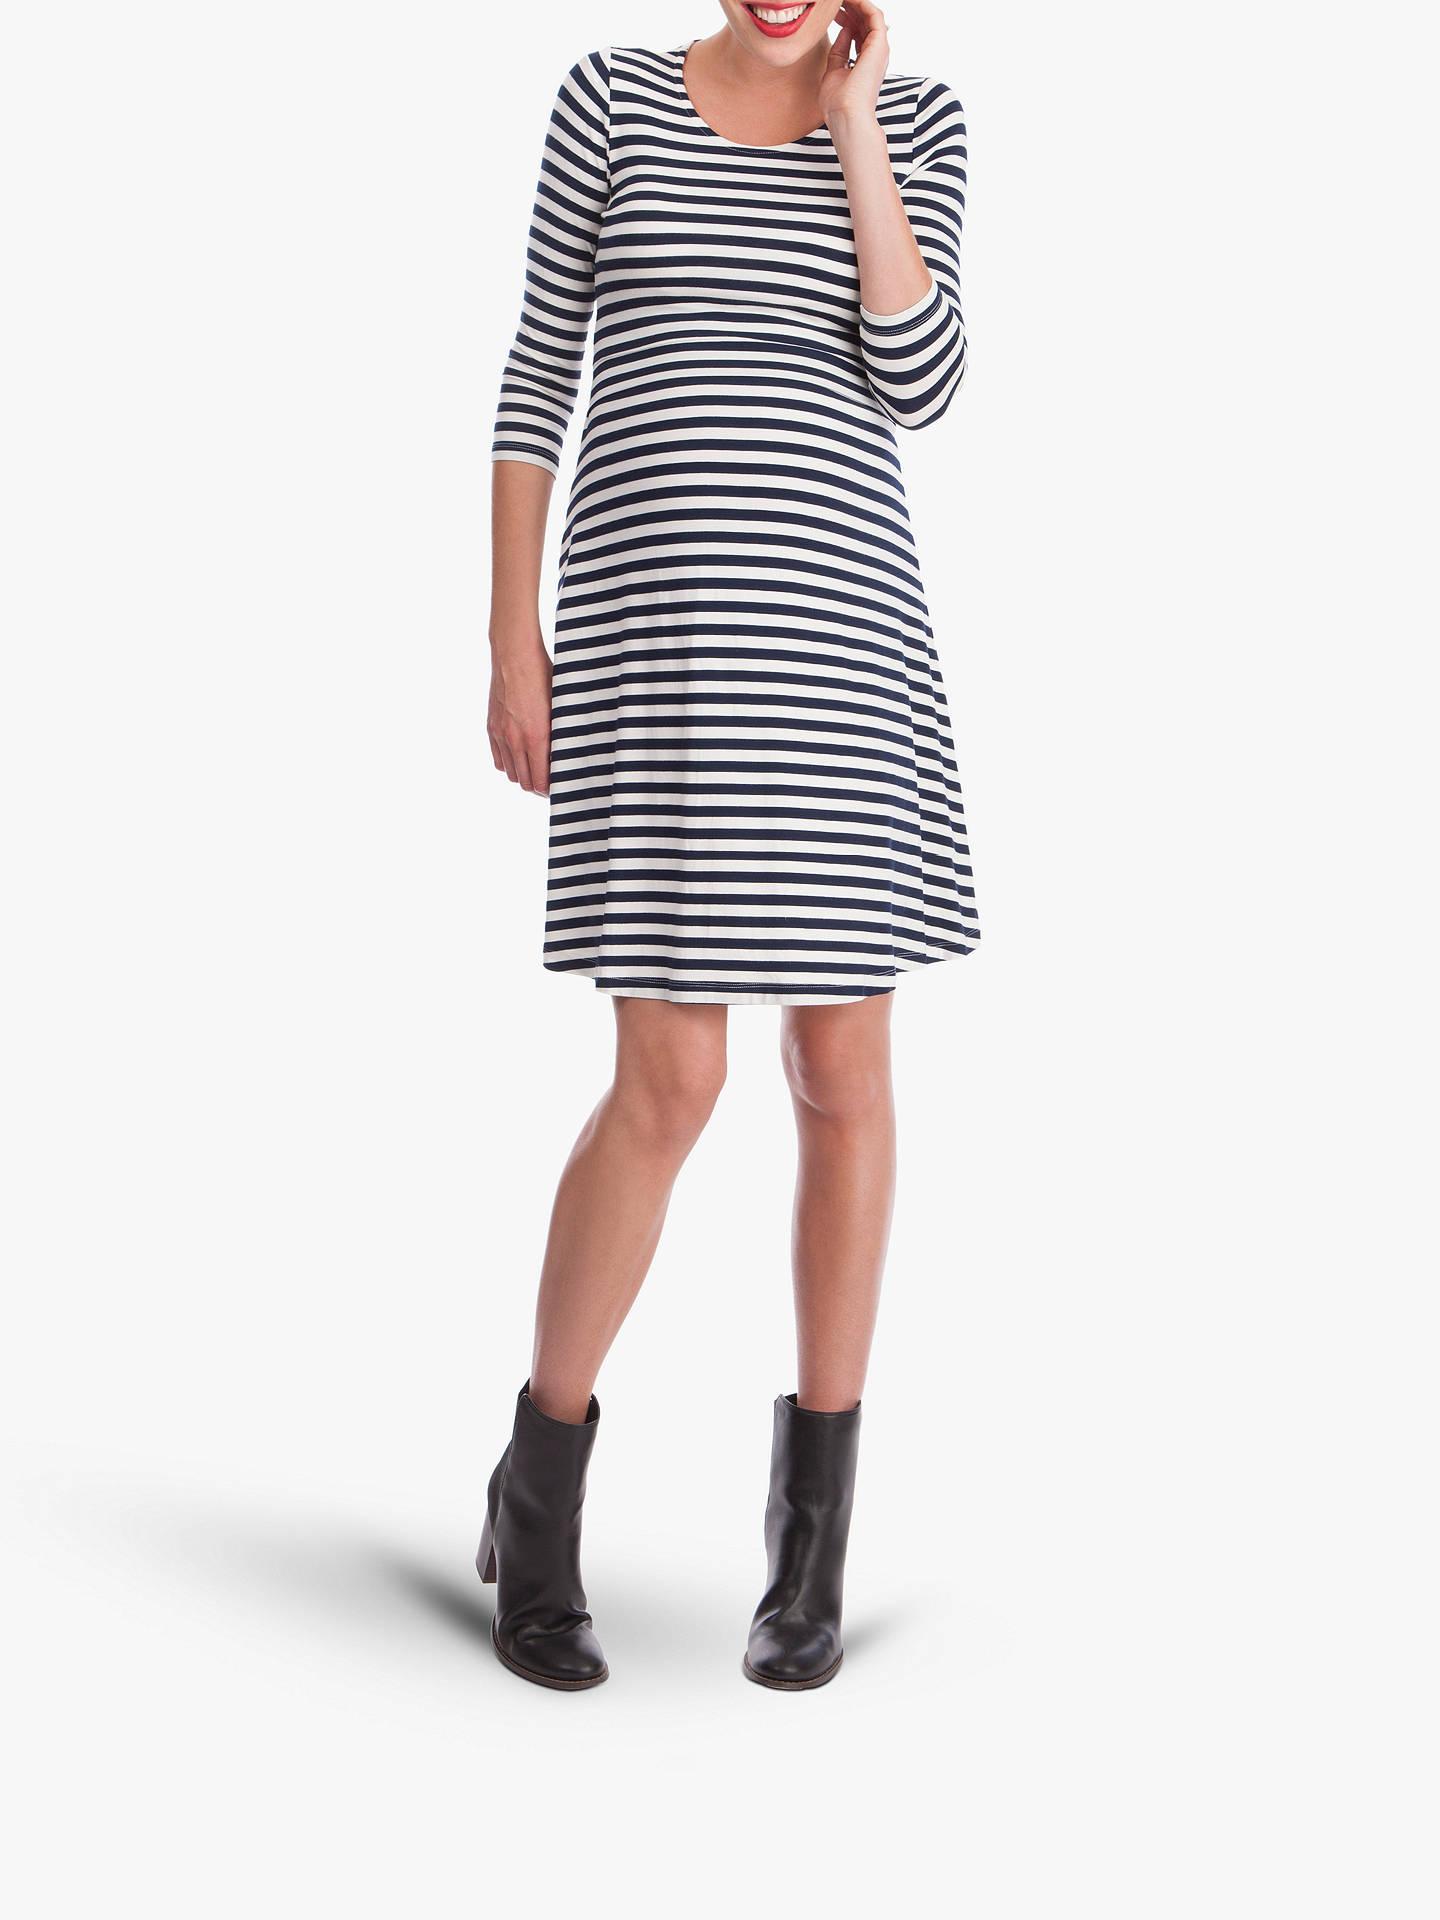 16d1bc7c8b857 Buy Séraphine Nadia Nautical Stripe Nursing Maternity Dress, Navy/White, 8  Online at ...